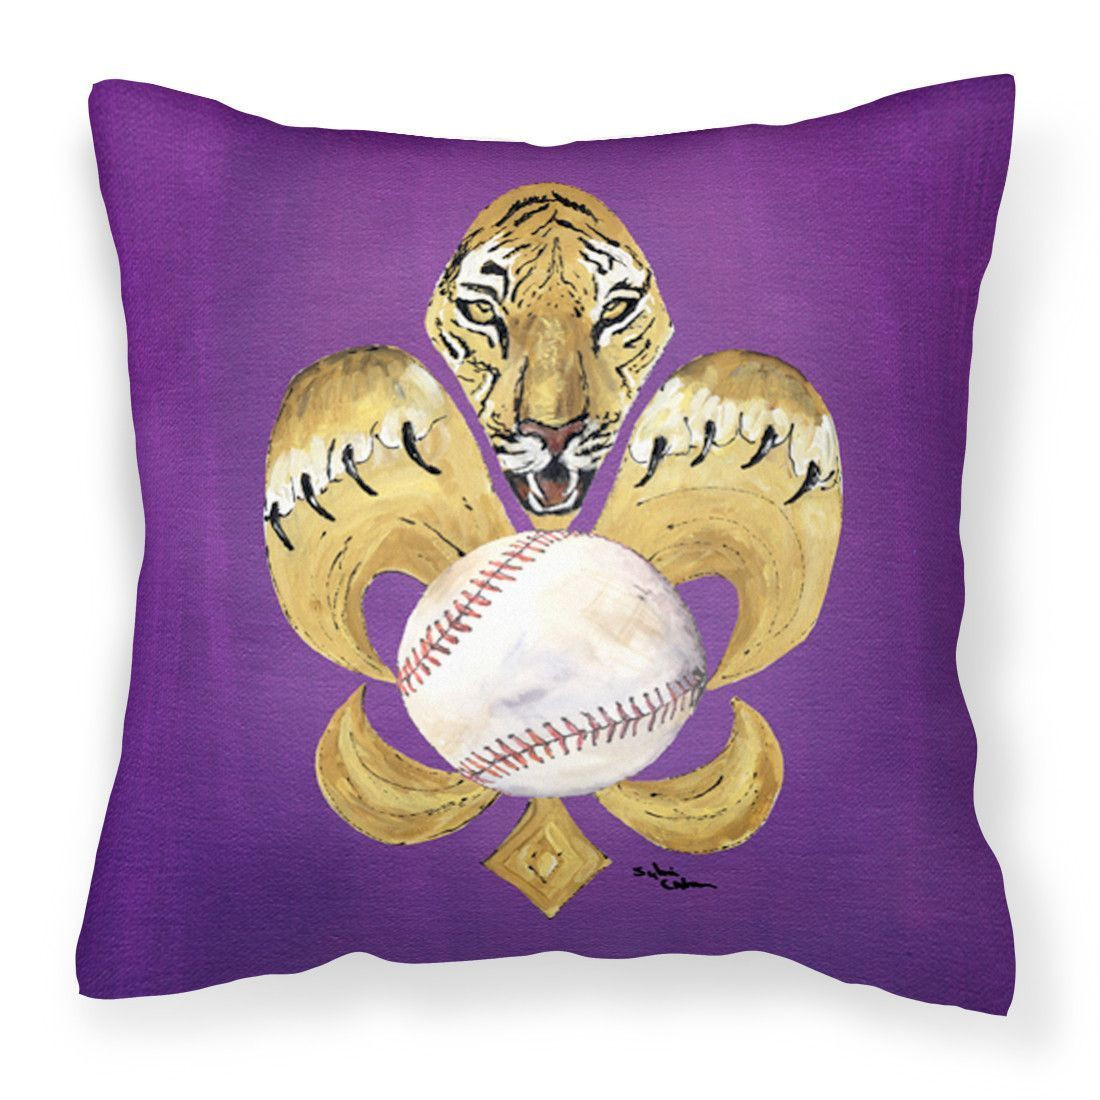 Tiger Fleur de lis Baseball Fabric Decorative Pillow 8476PW1414